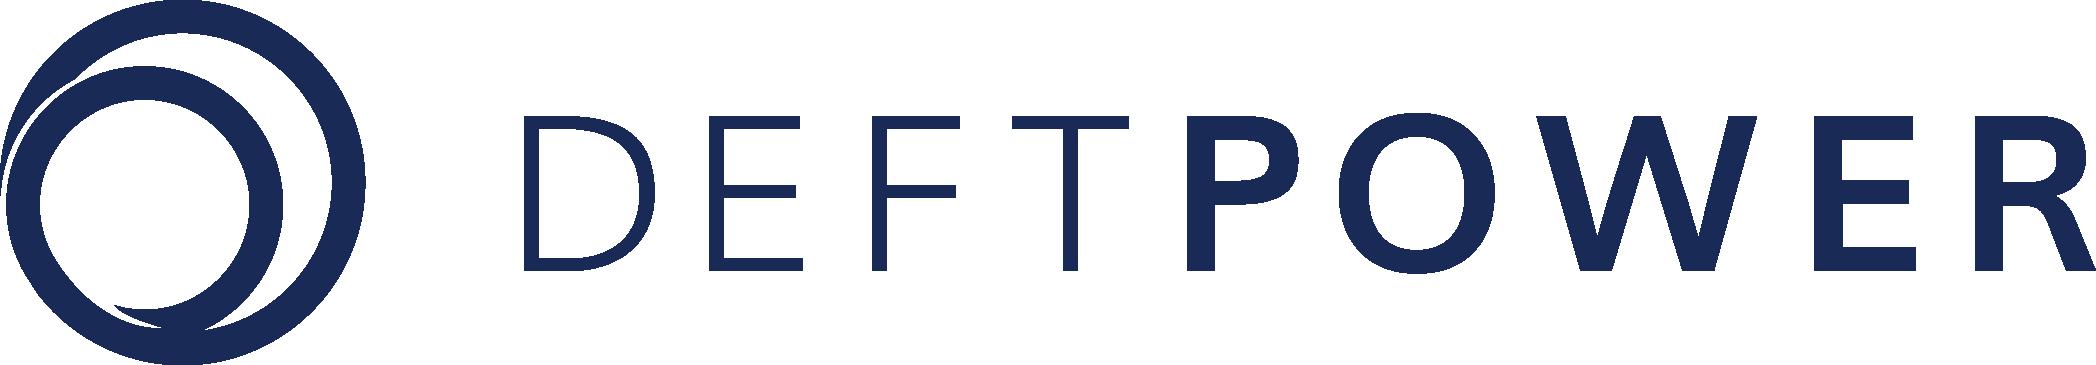 Deftpower B.V. logo